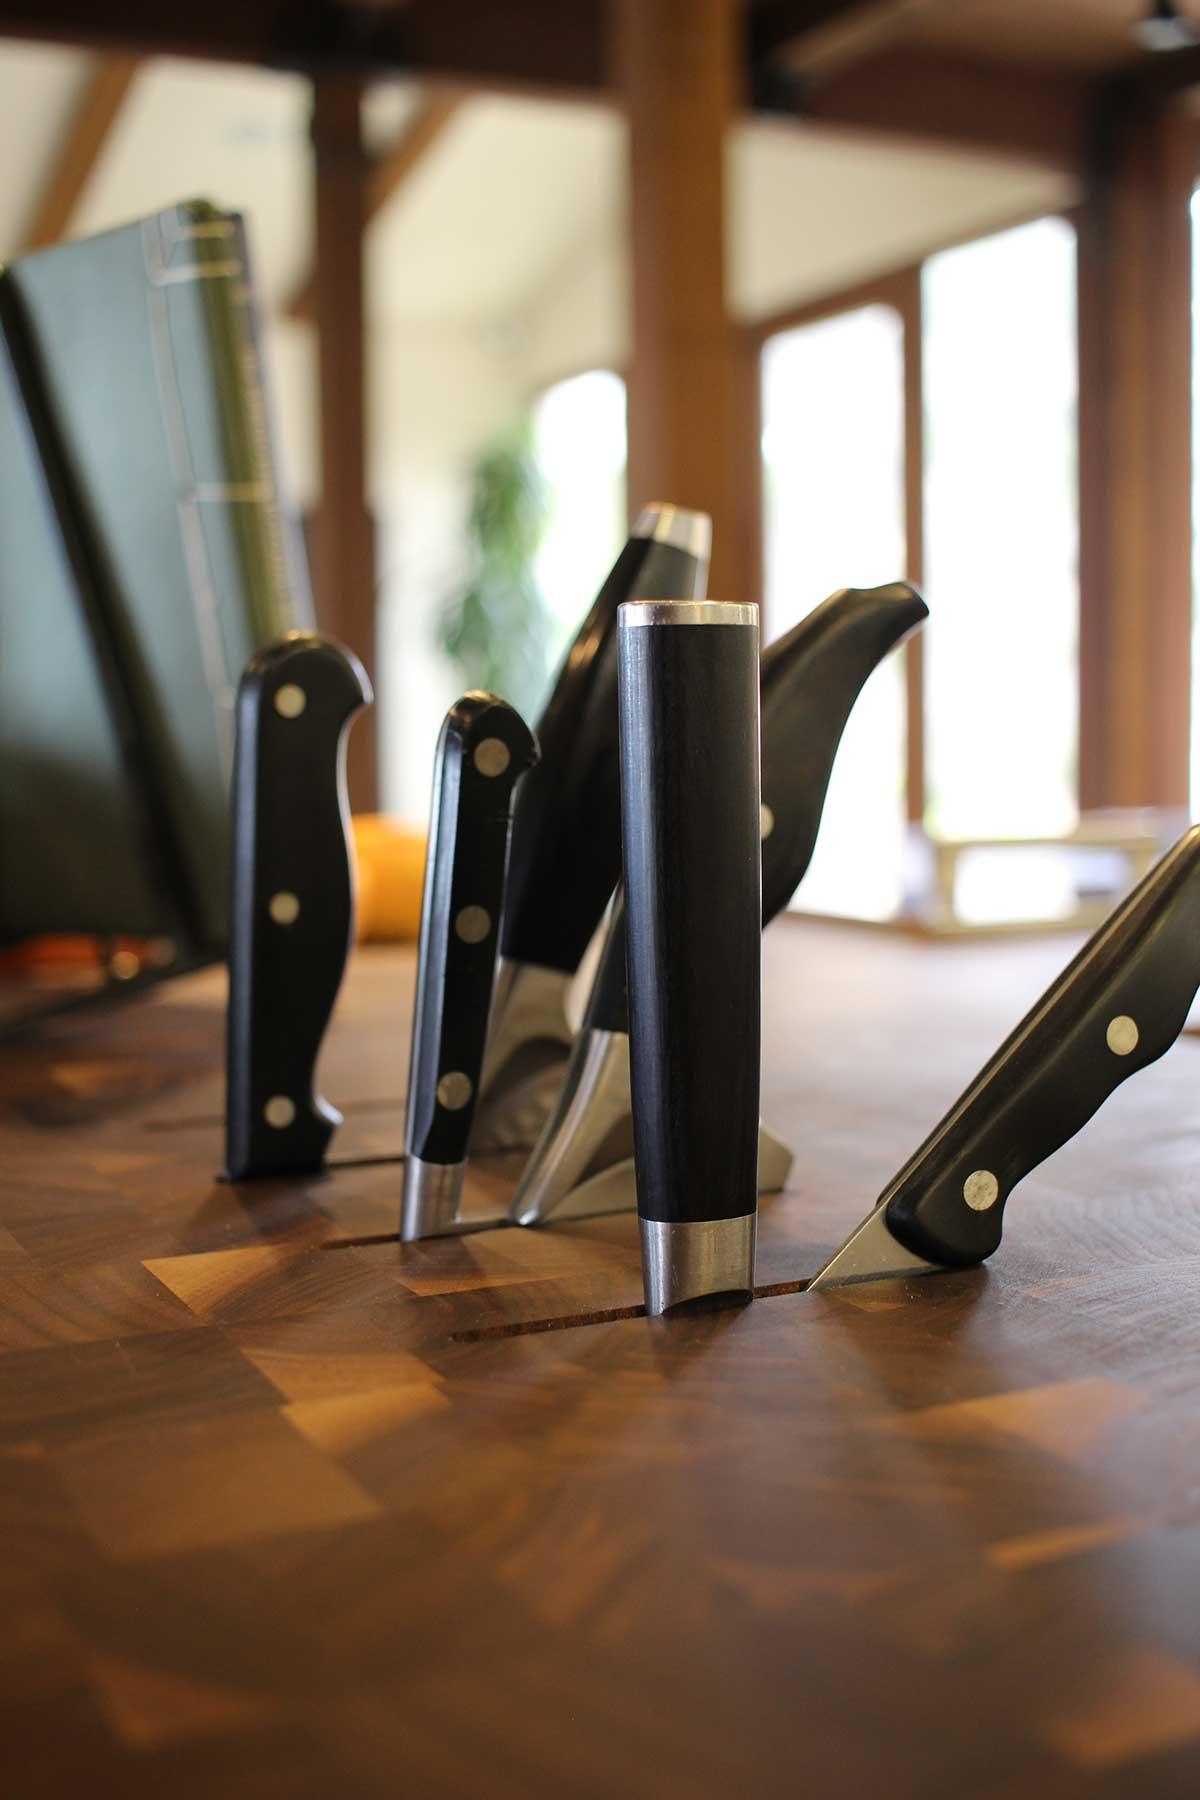 Custom Wood Butcher Block Countertops with Knife Slots